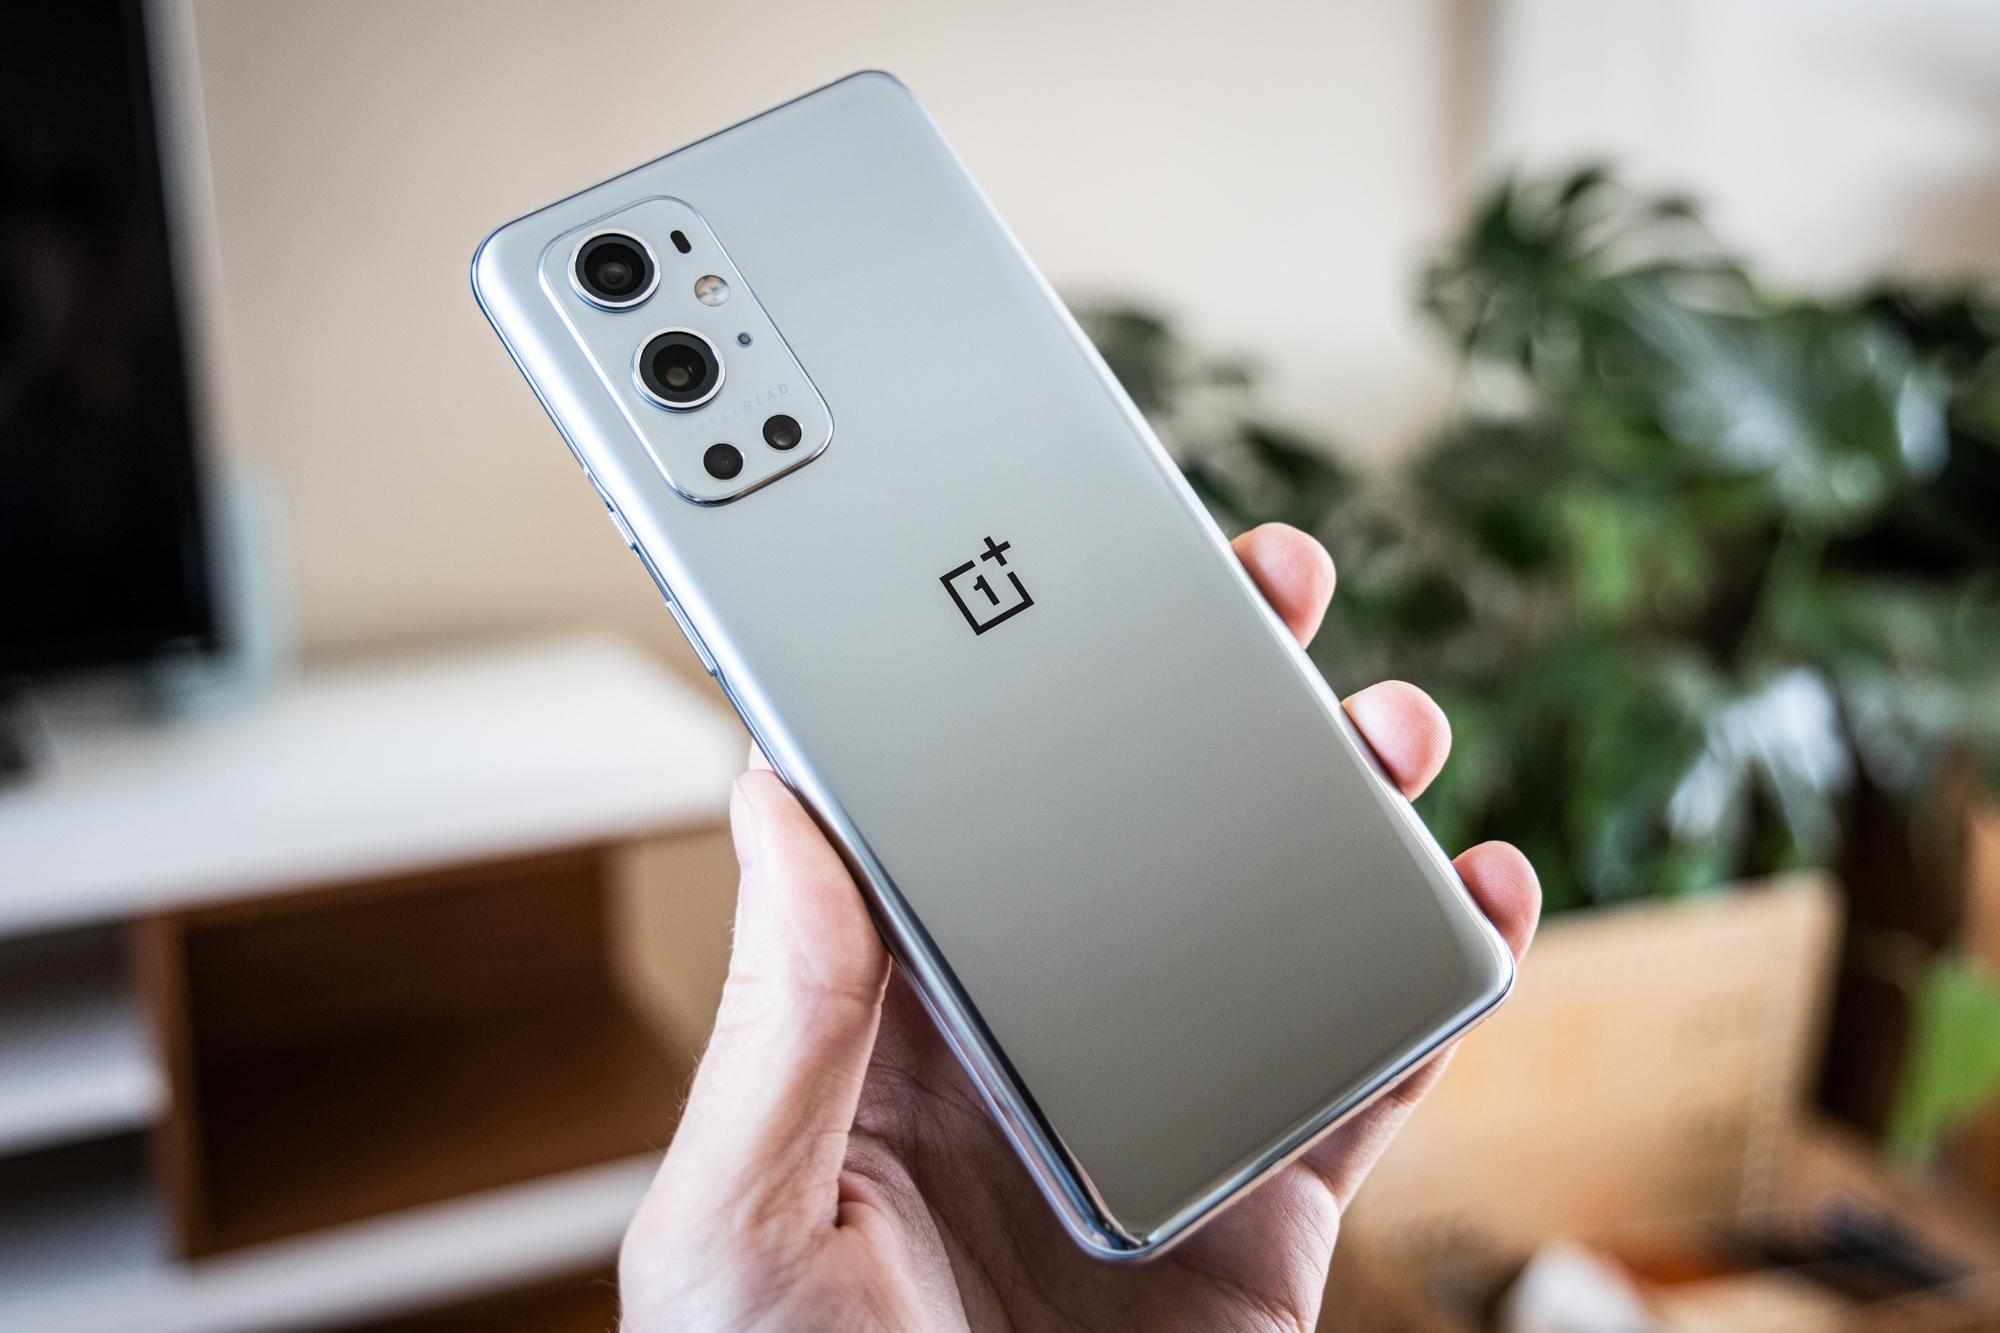 OnePlus pourrait-il adopter HarmonyOS, le système d'exploitation de Huawei ?